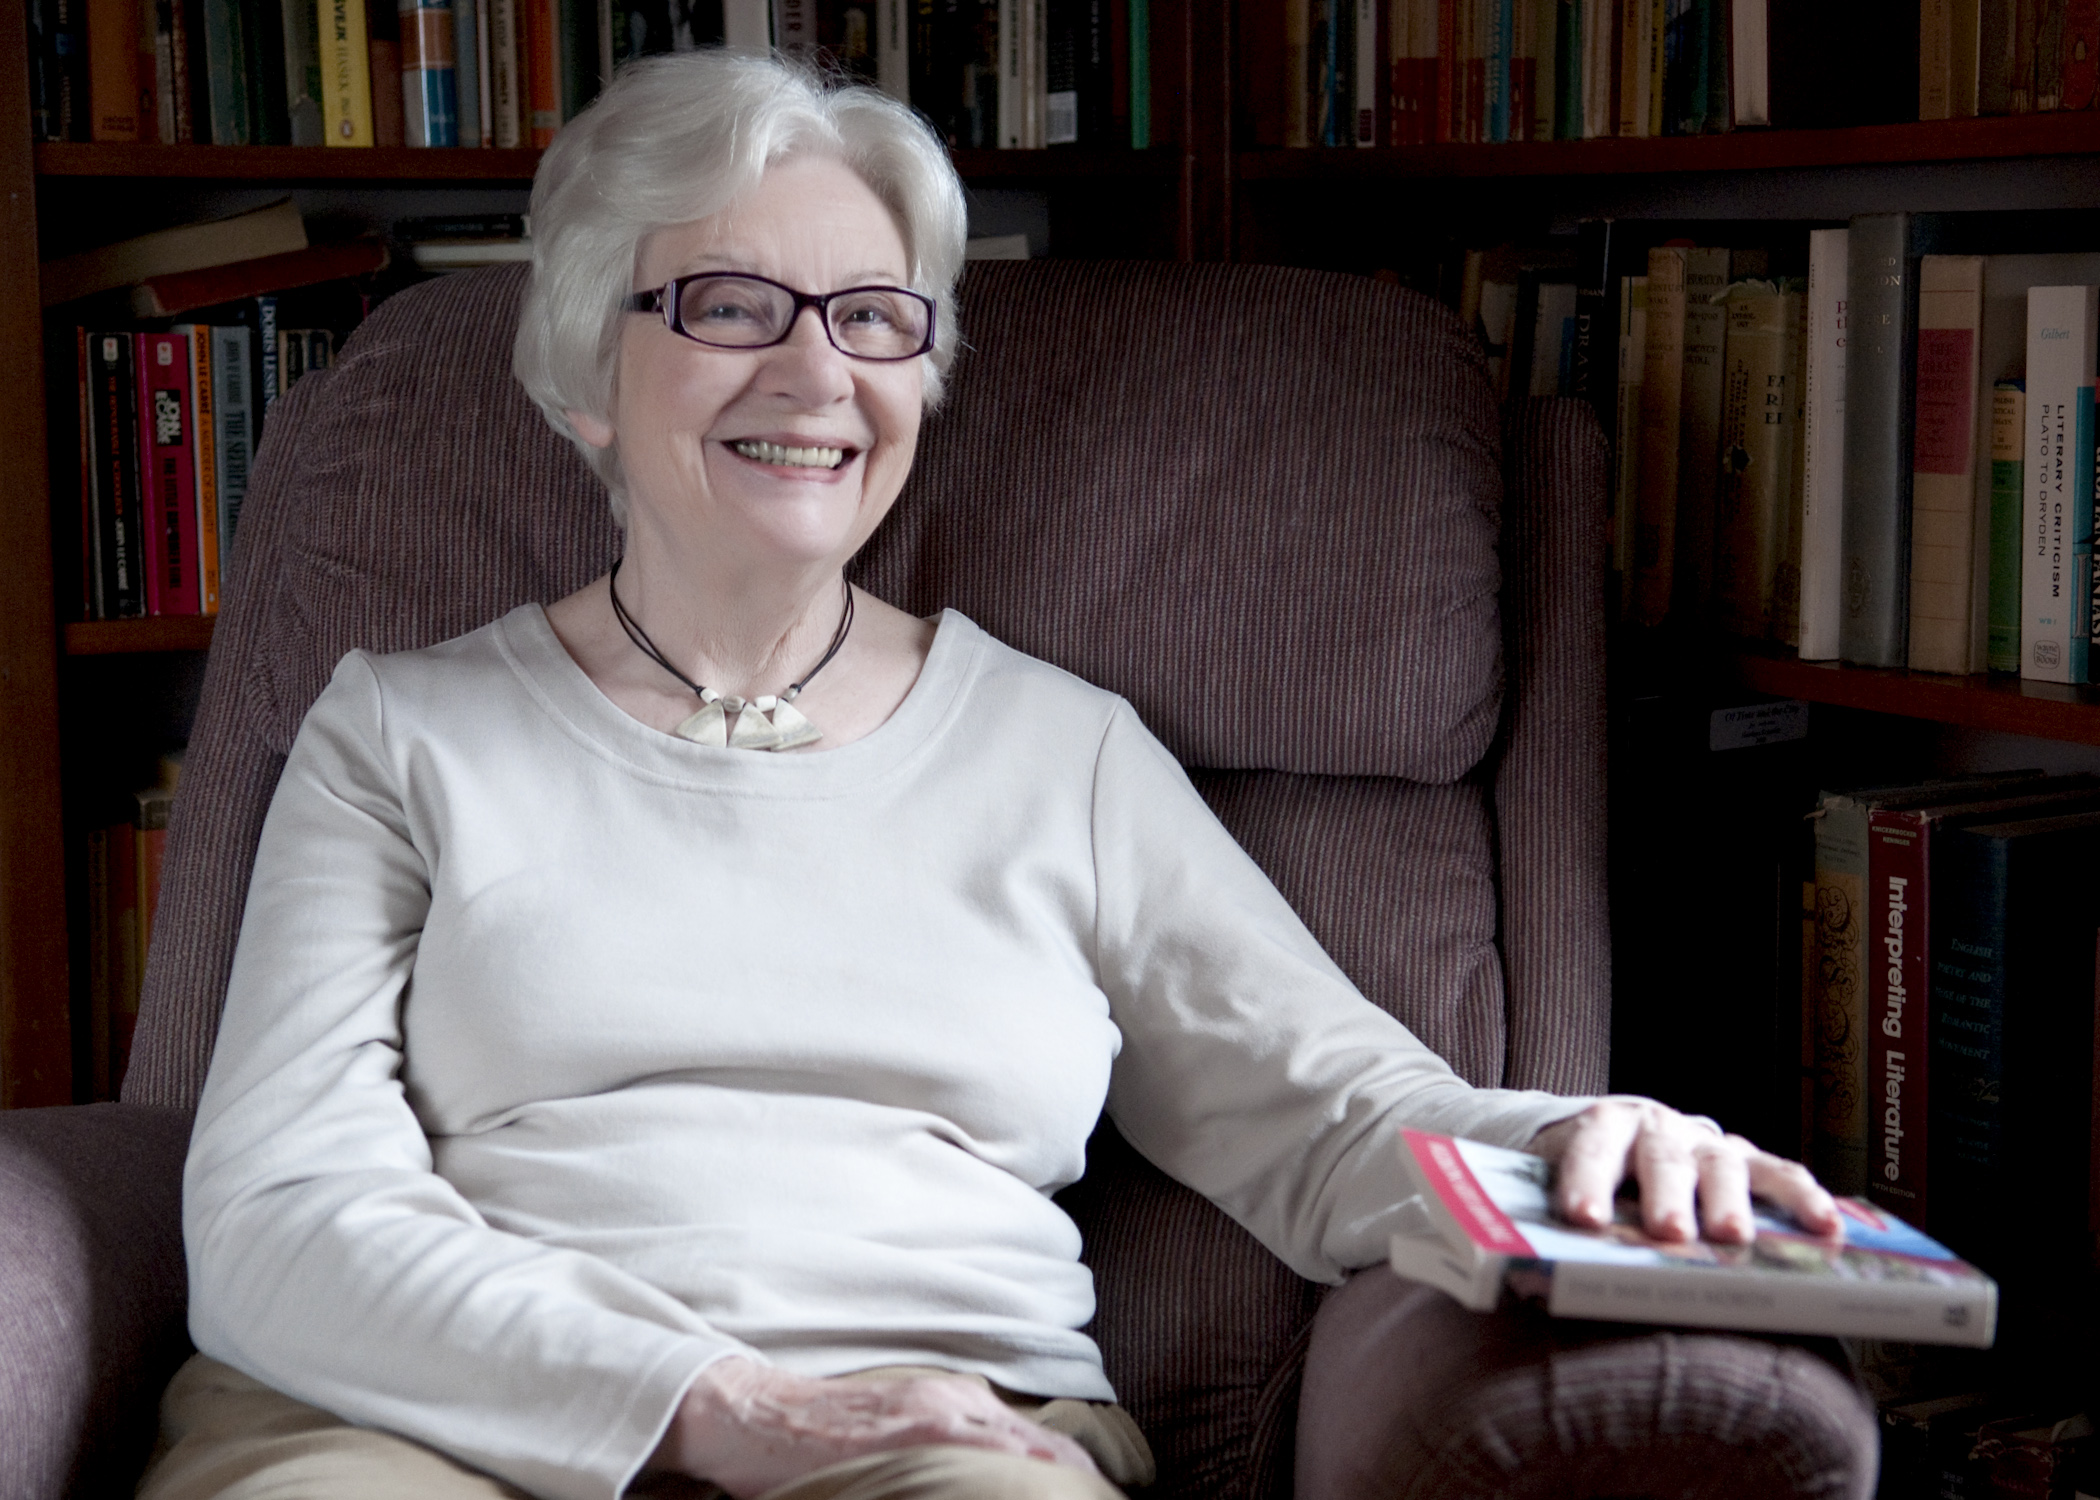 Jean Rae Baxter